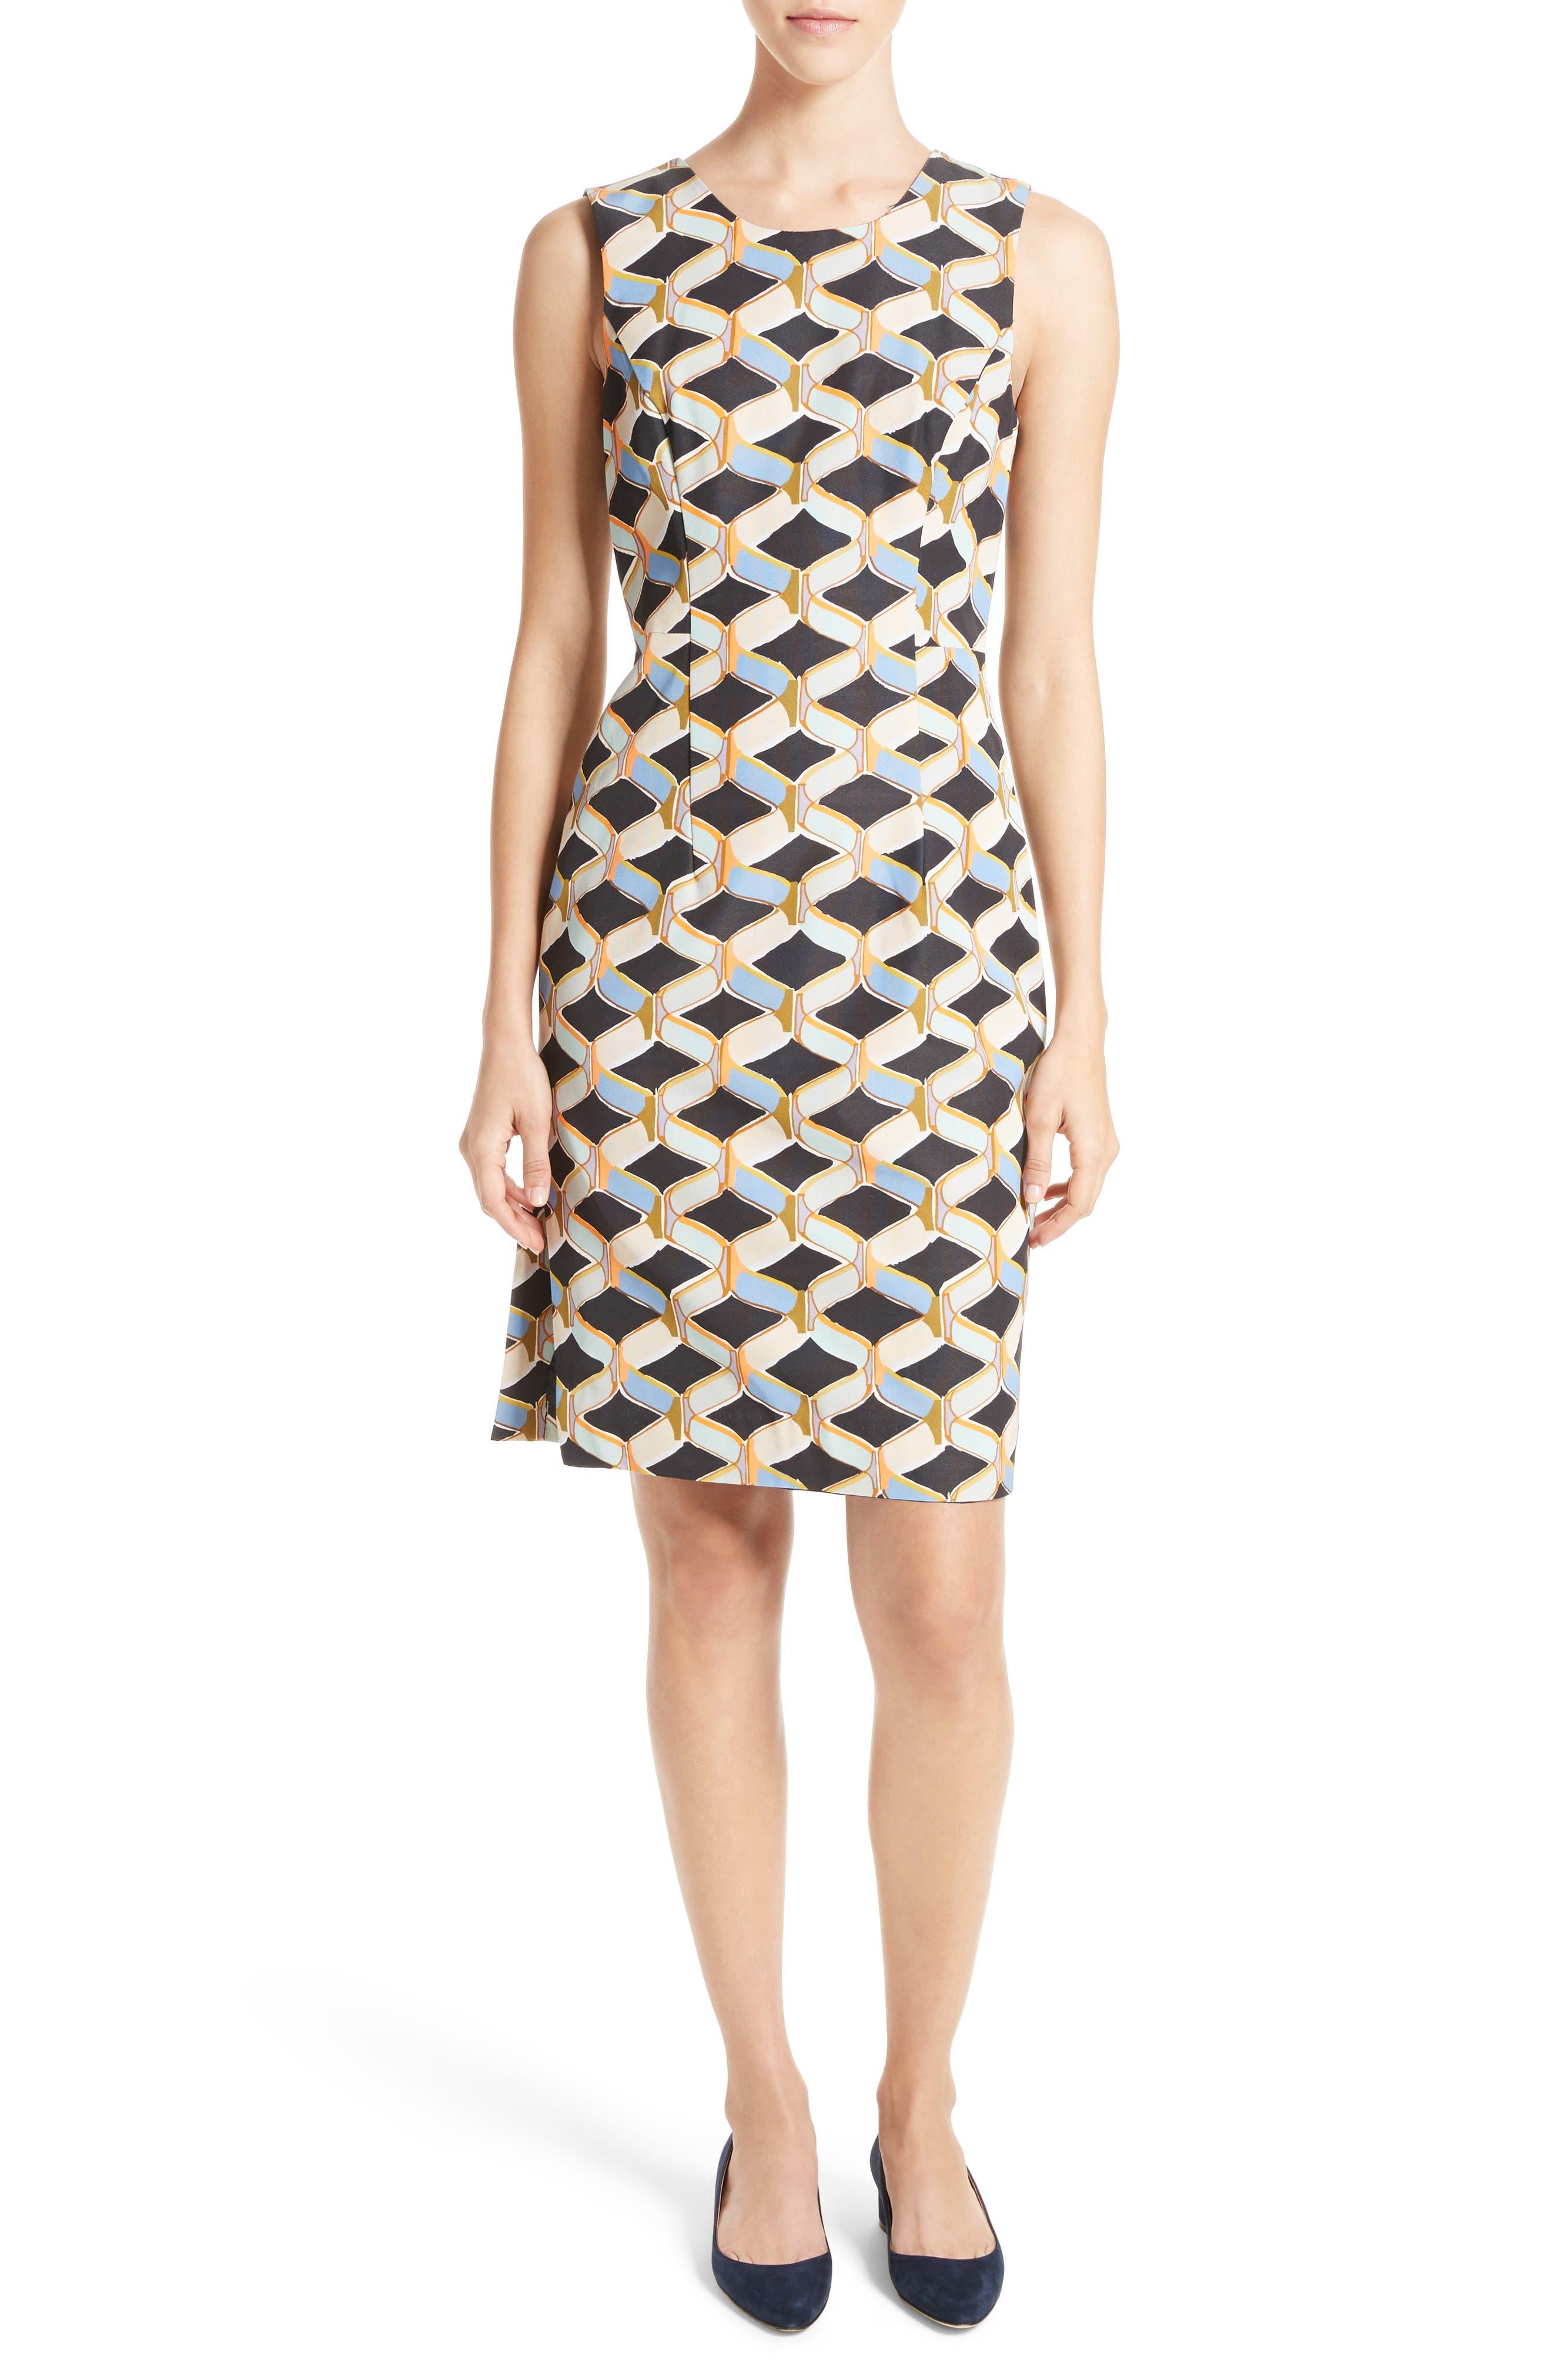 Milly Kendra Chain Print Shift Dress